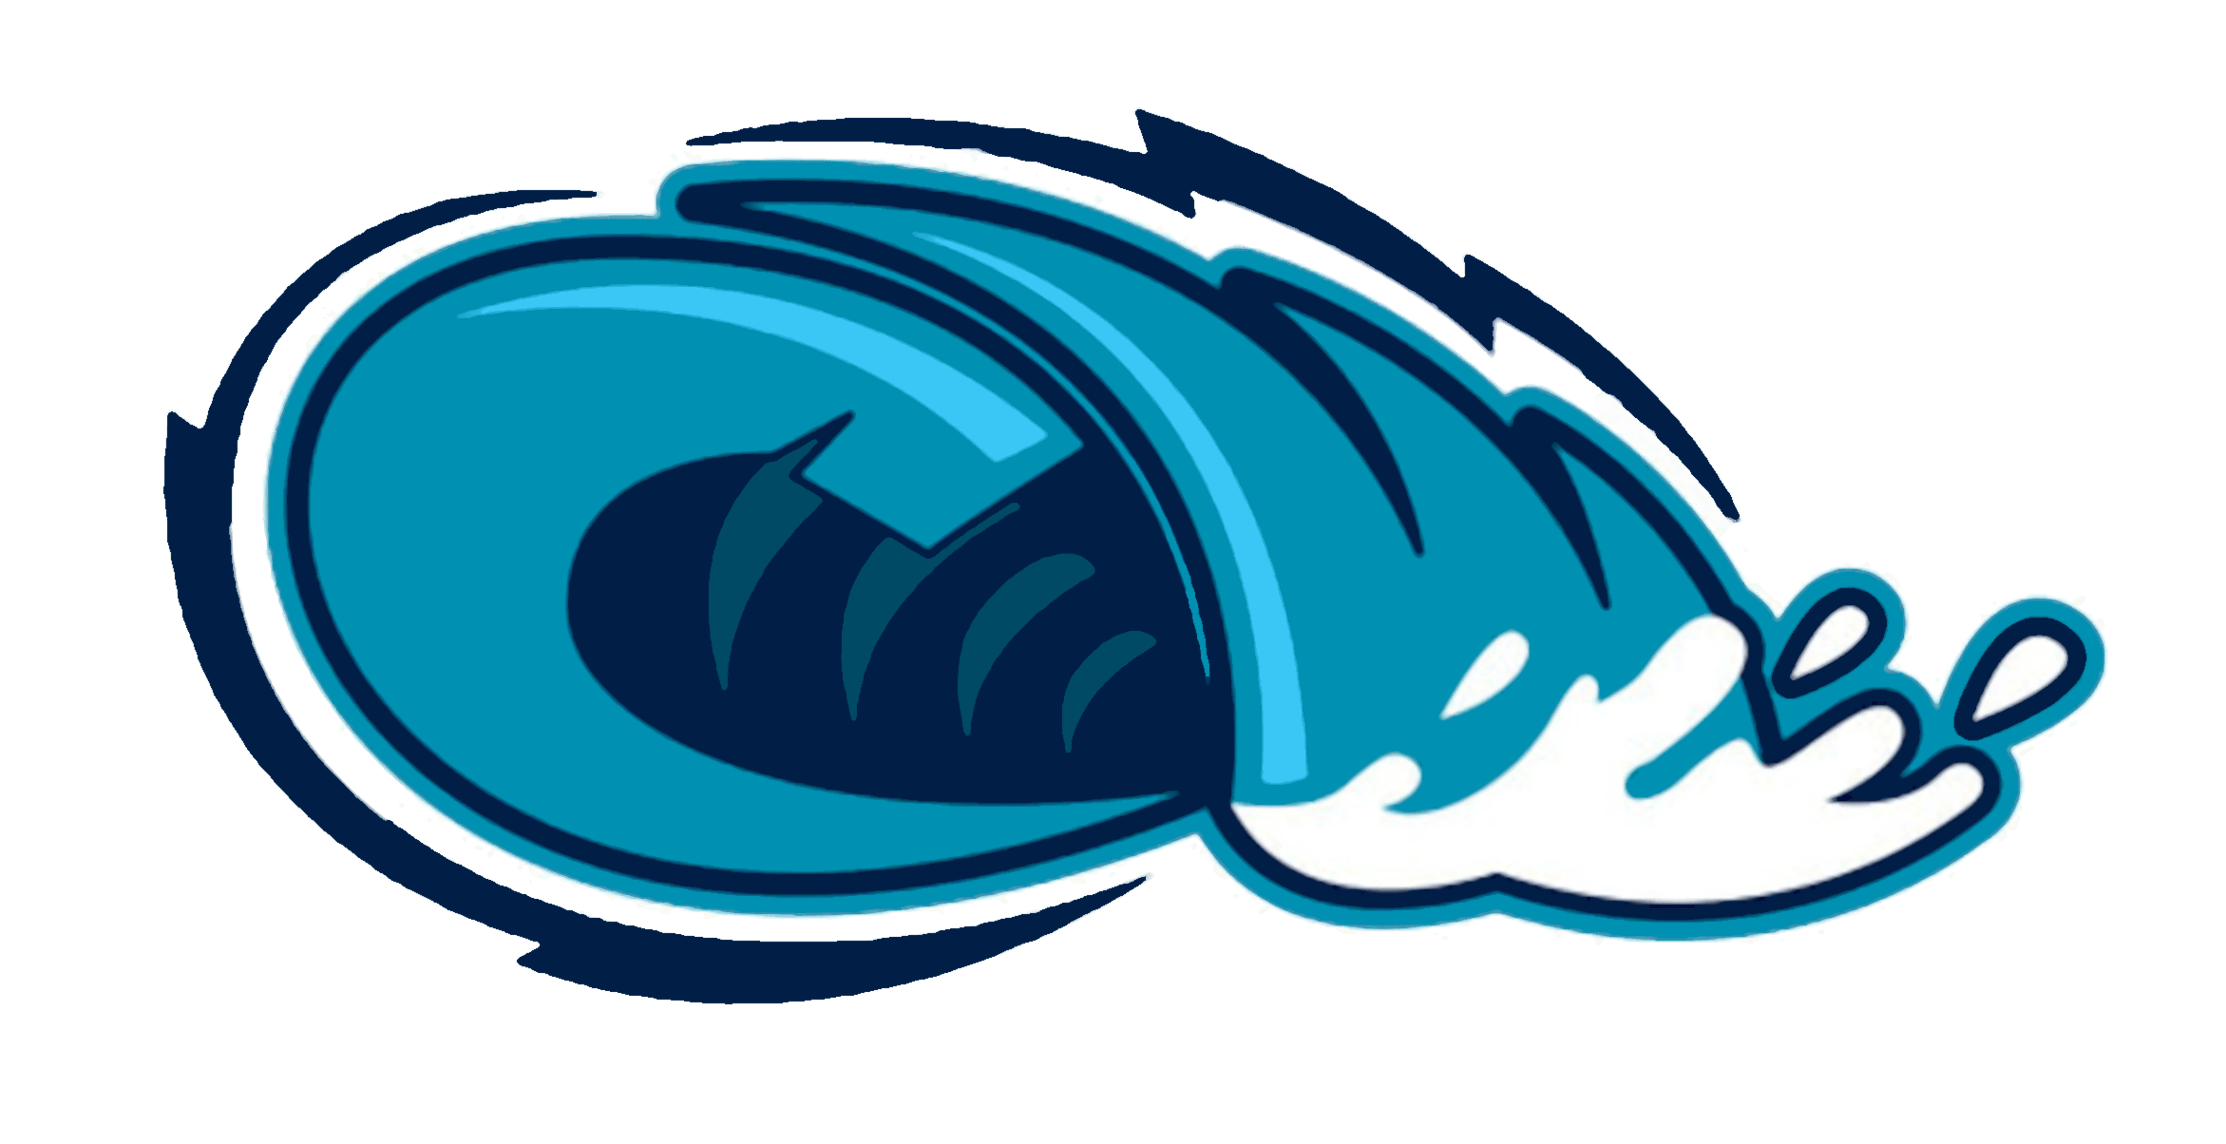 Wave border free download. Waves clipart tide